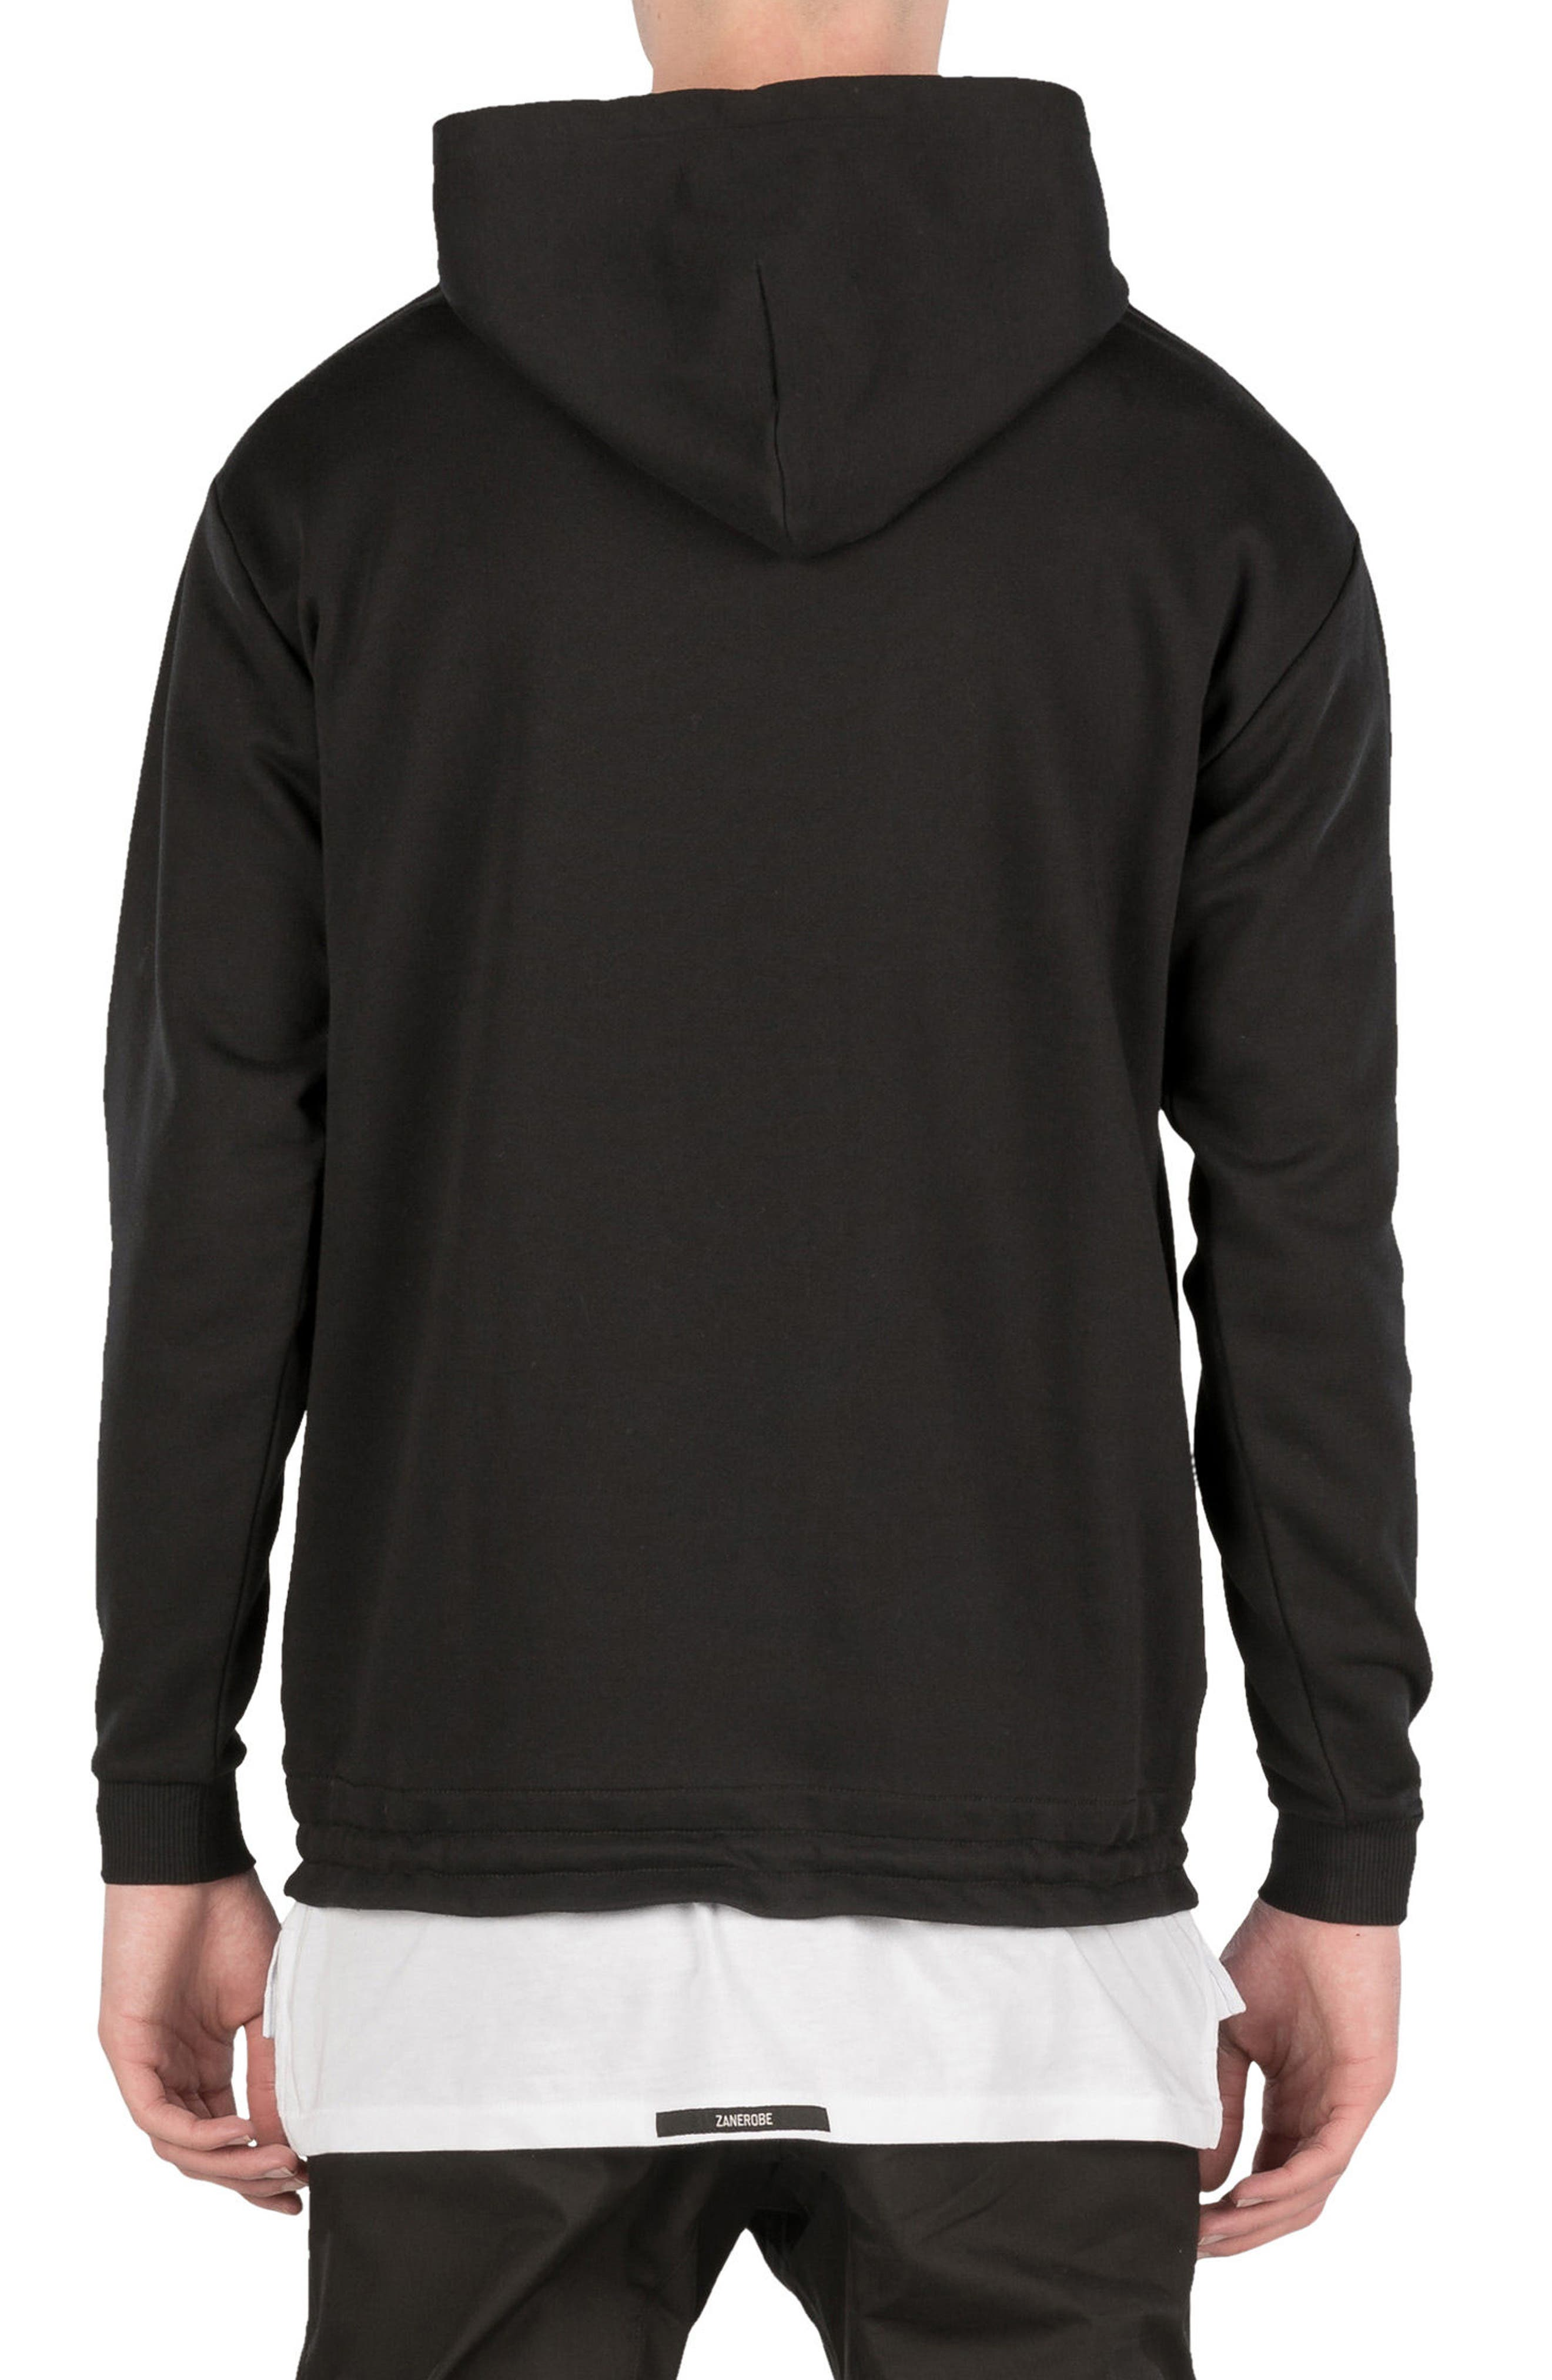 Teamwear Box Hoodie Sweatshirt,                             Alternate thumbnail 2, color,                             Black